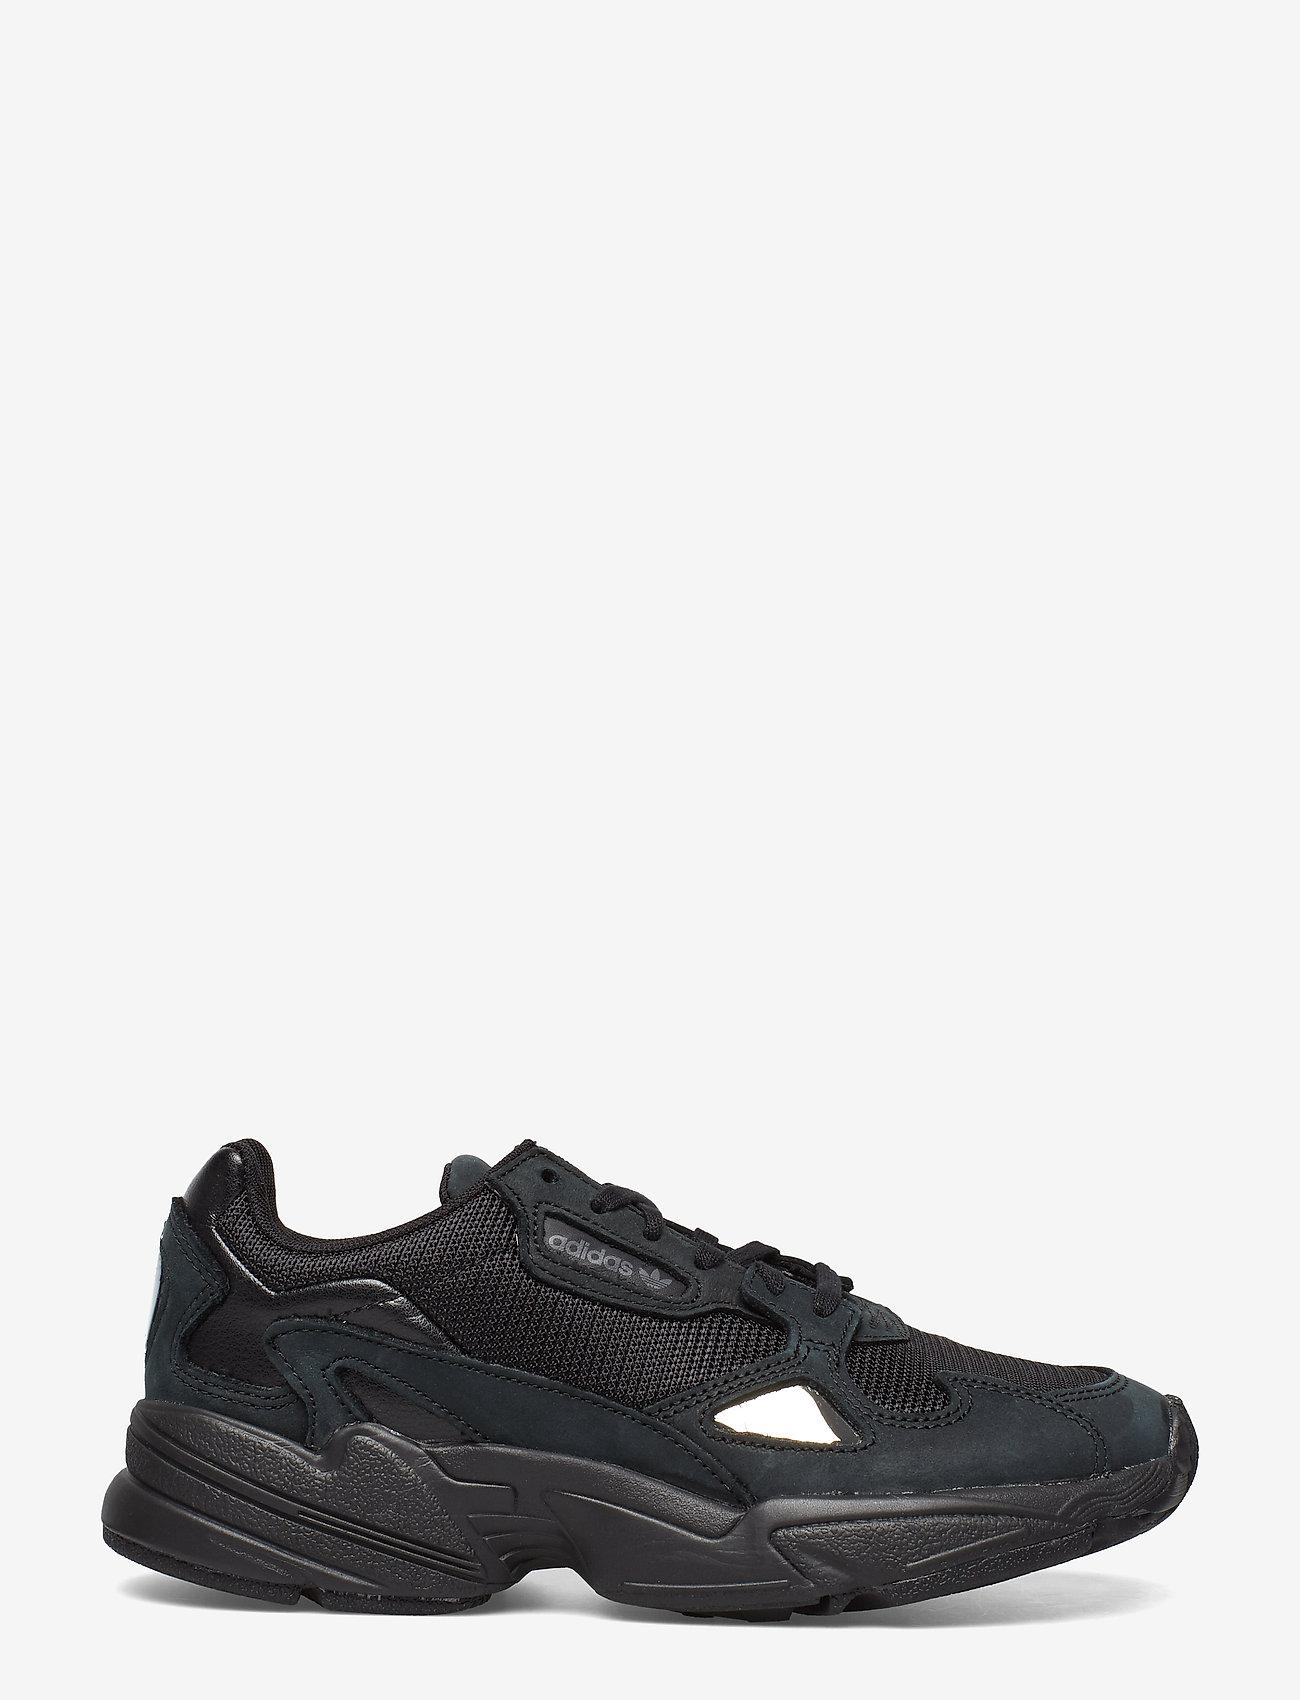 adidas Originals - FALCON W - chunky sneakers - cblack/cblack/grefiv - 1